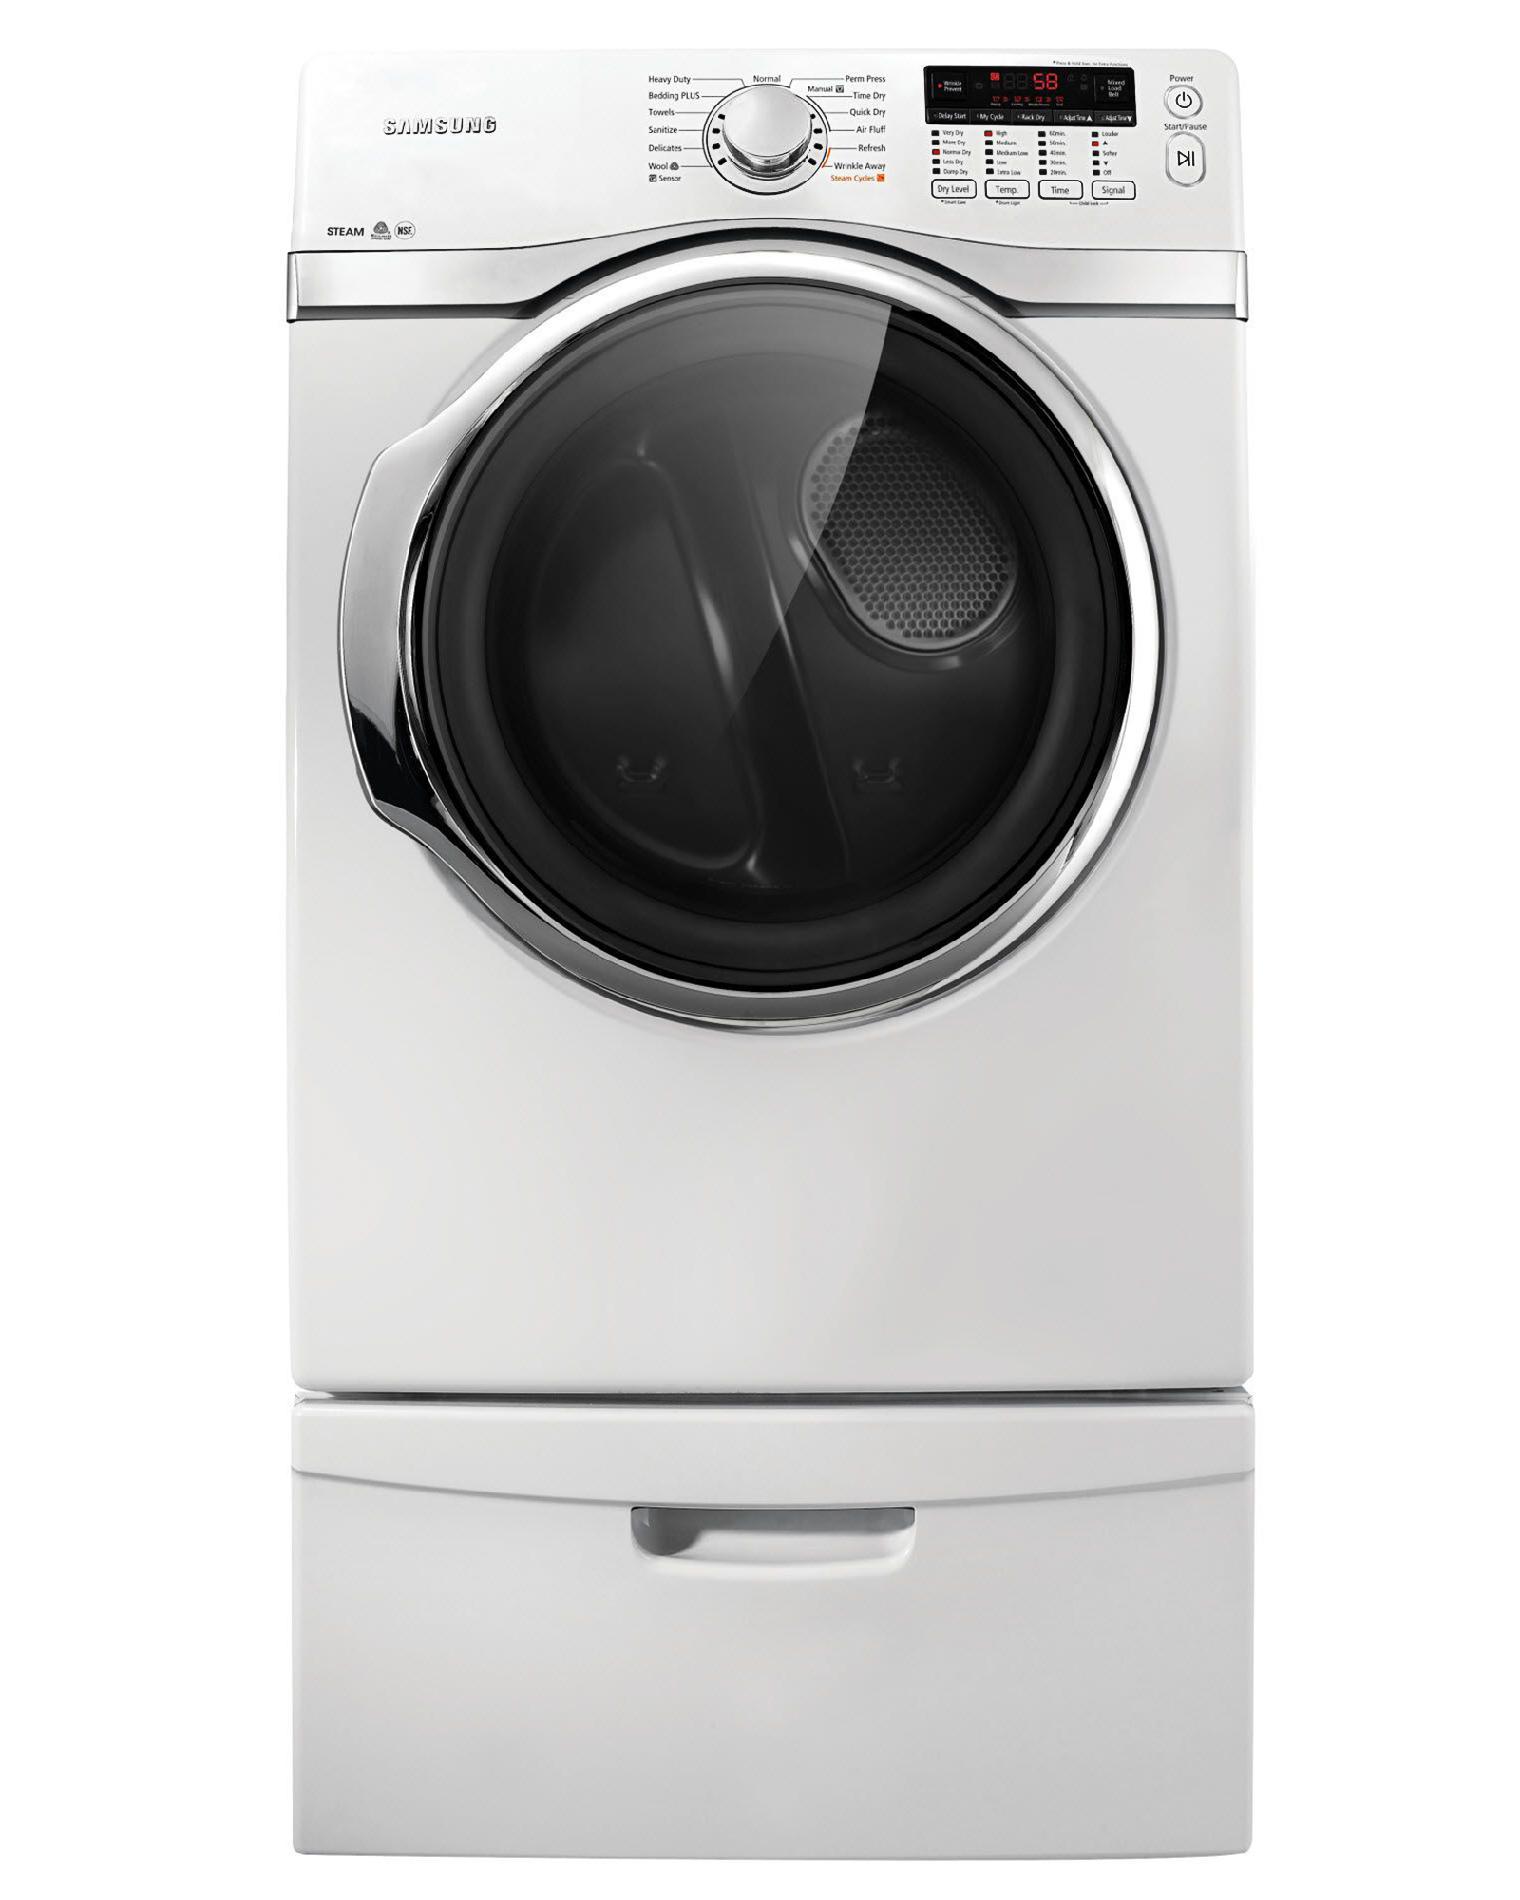 Samsung 7.4 cu. ft. Electric Dryer - White